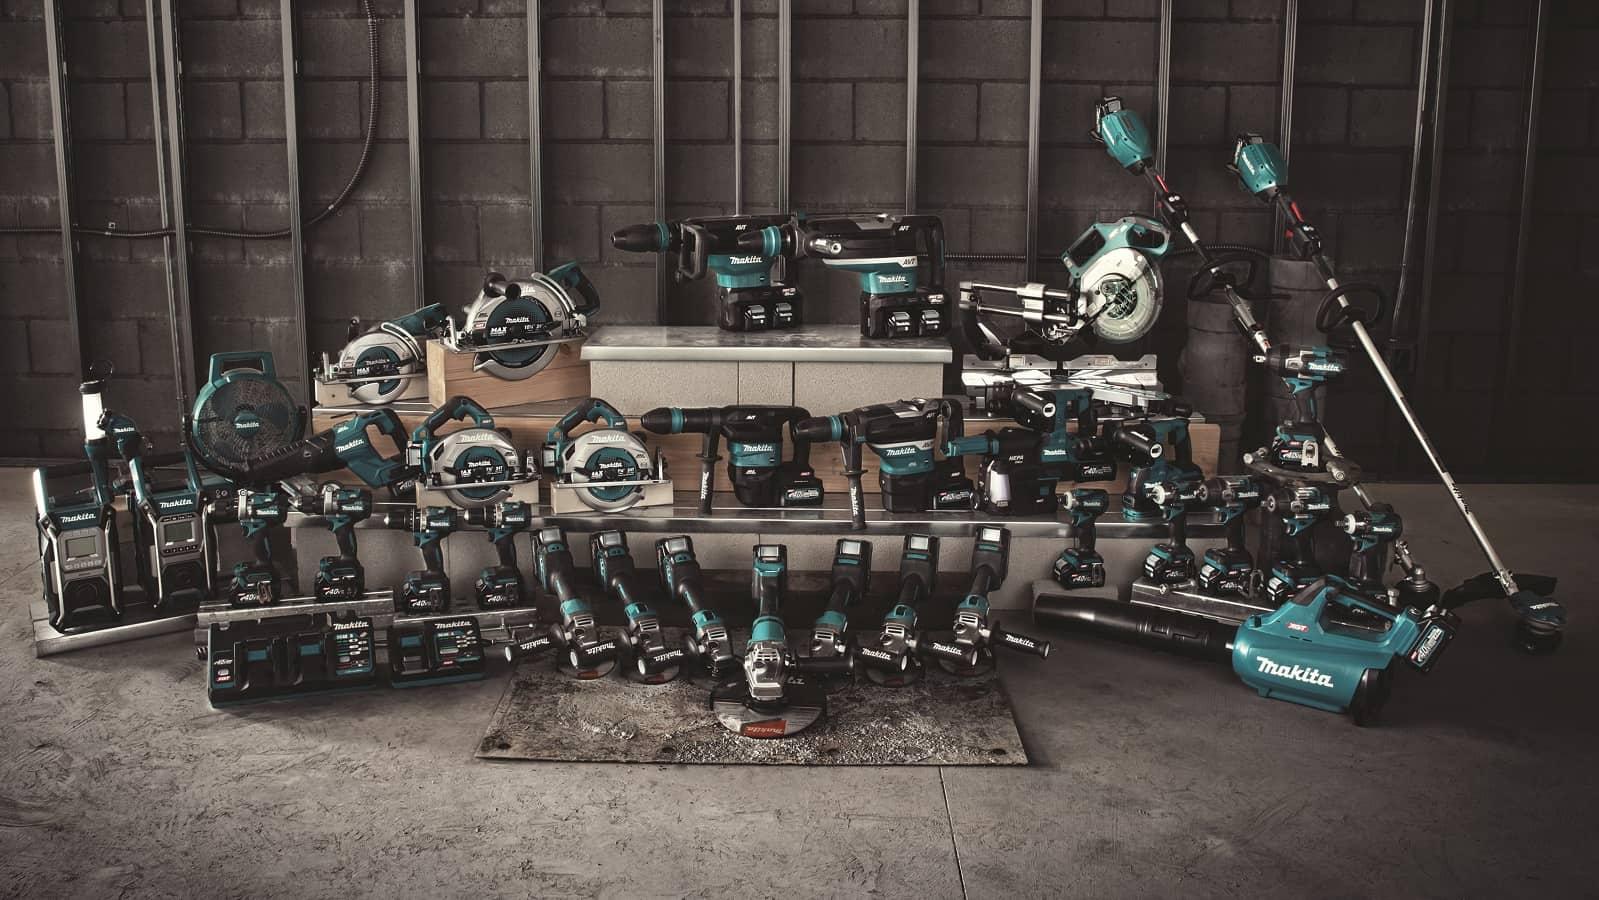 New Makita XGT 40V / 80V Max Cordless Power Tool Line Officially Announced